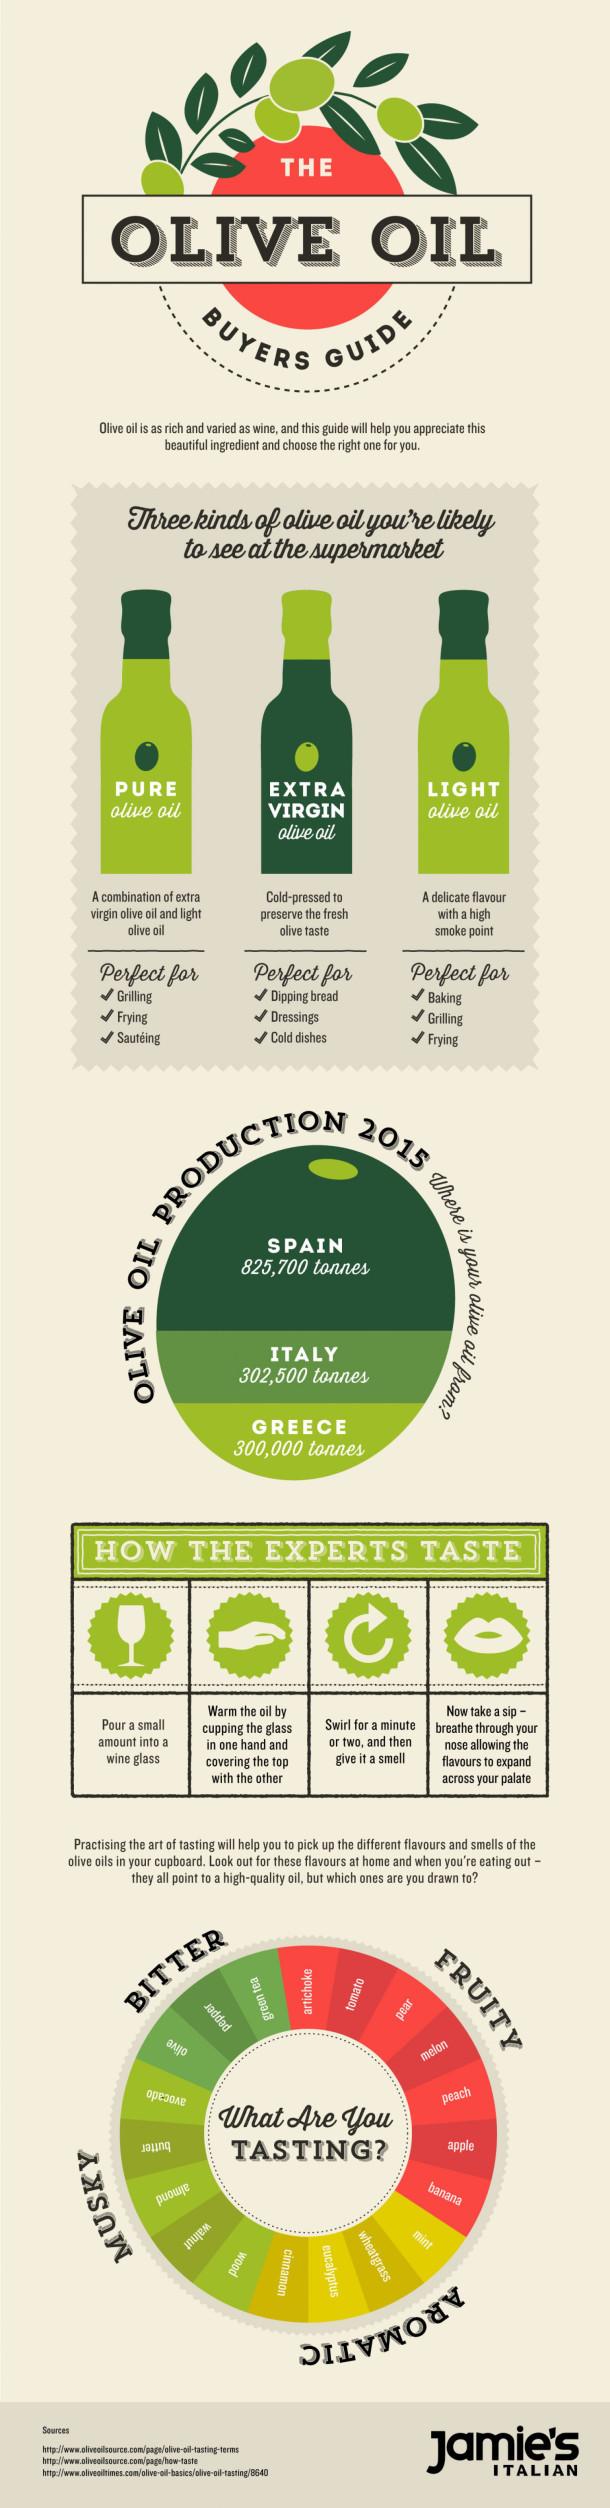 Jamie Oliver's olive oil guide